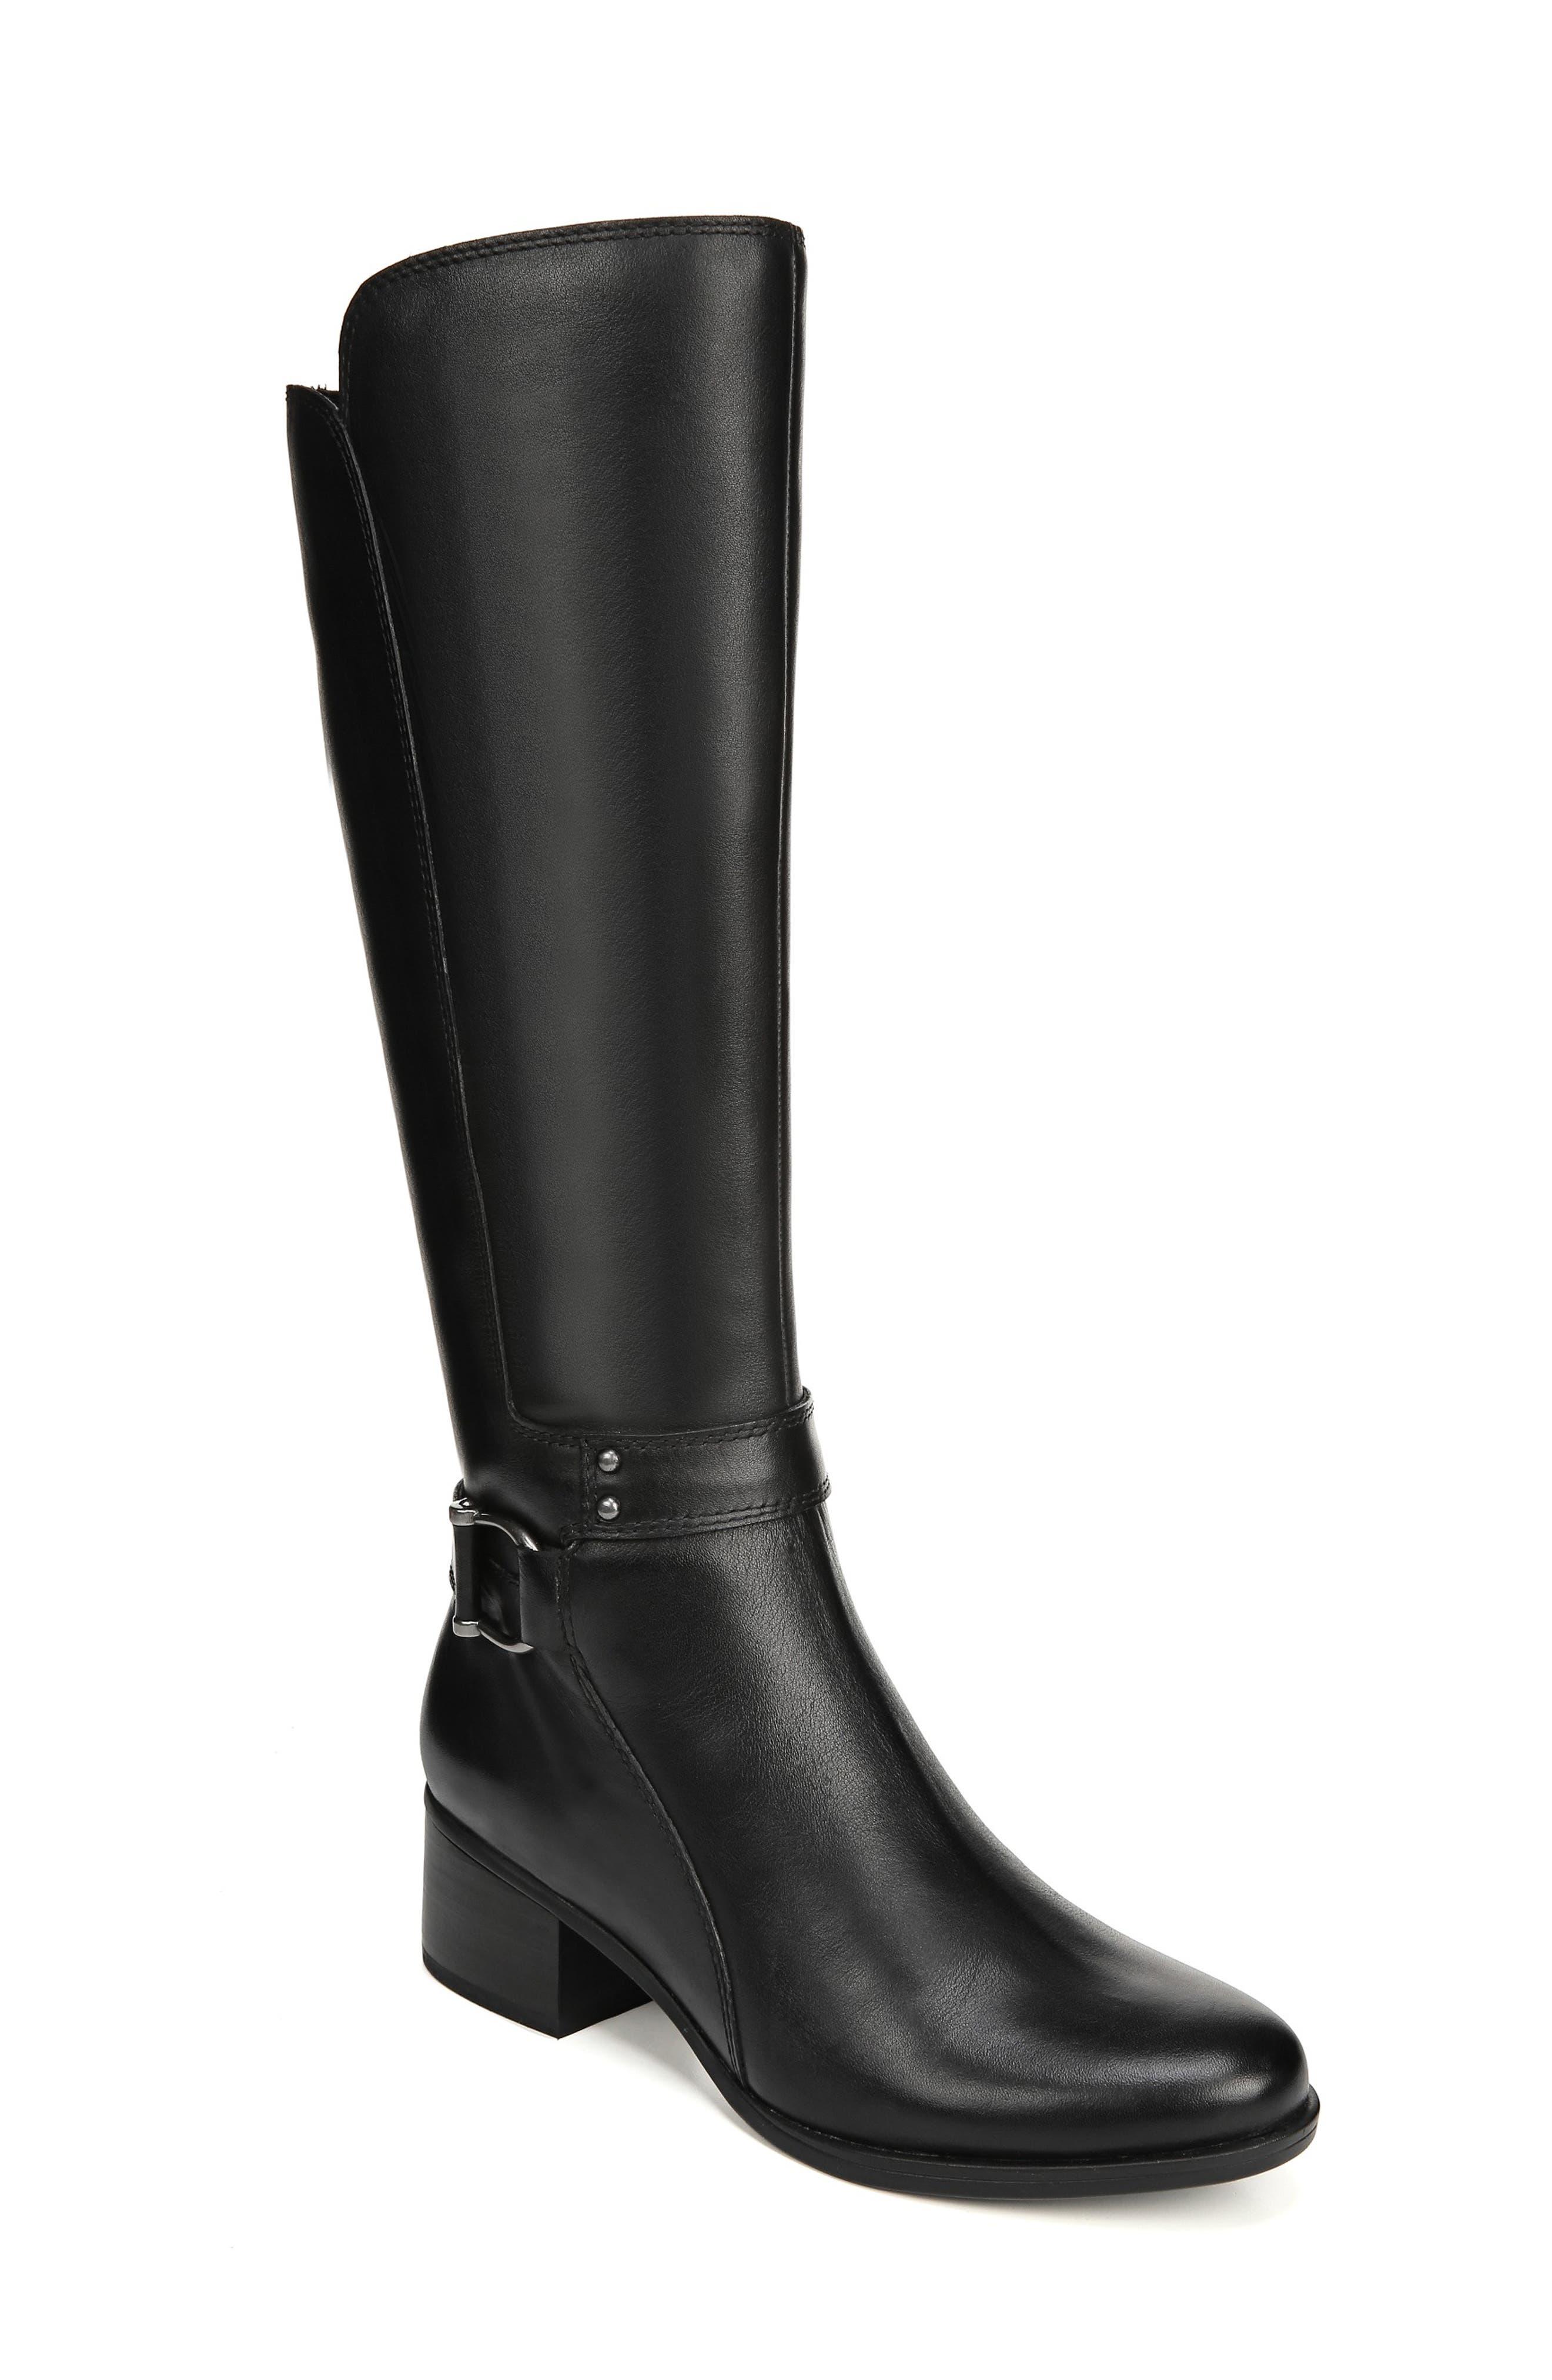 Naturalizer Dane Knee High Riding Boot, Regular Calf W - Black